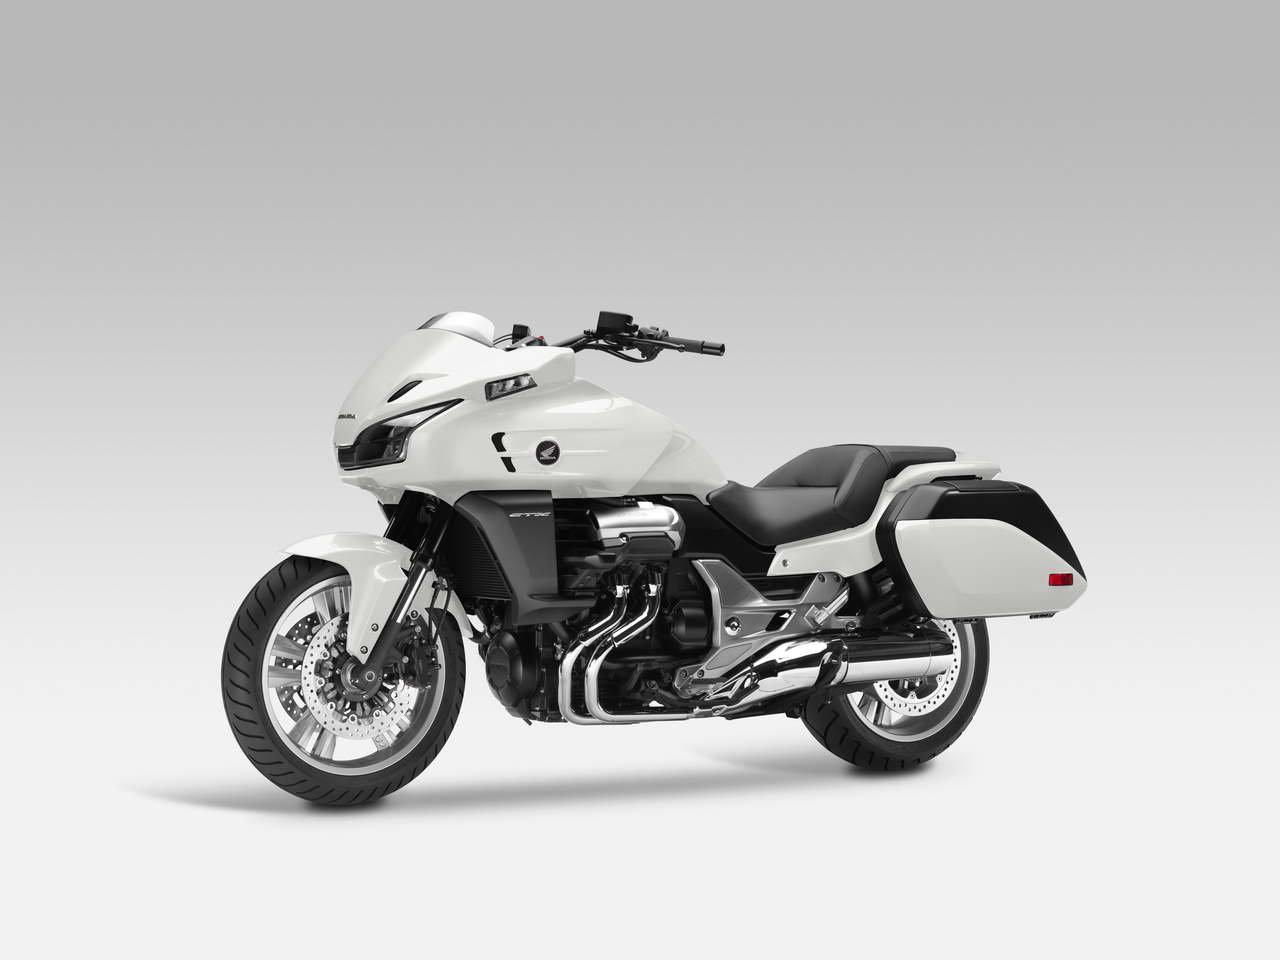 Listino Honda Crosstourer ABS Granturismo on-off - image 14679_honda-ctx1300 on http://moto.motori.net